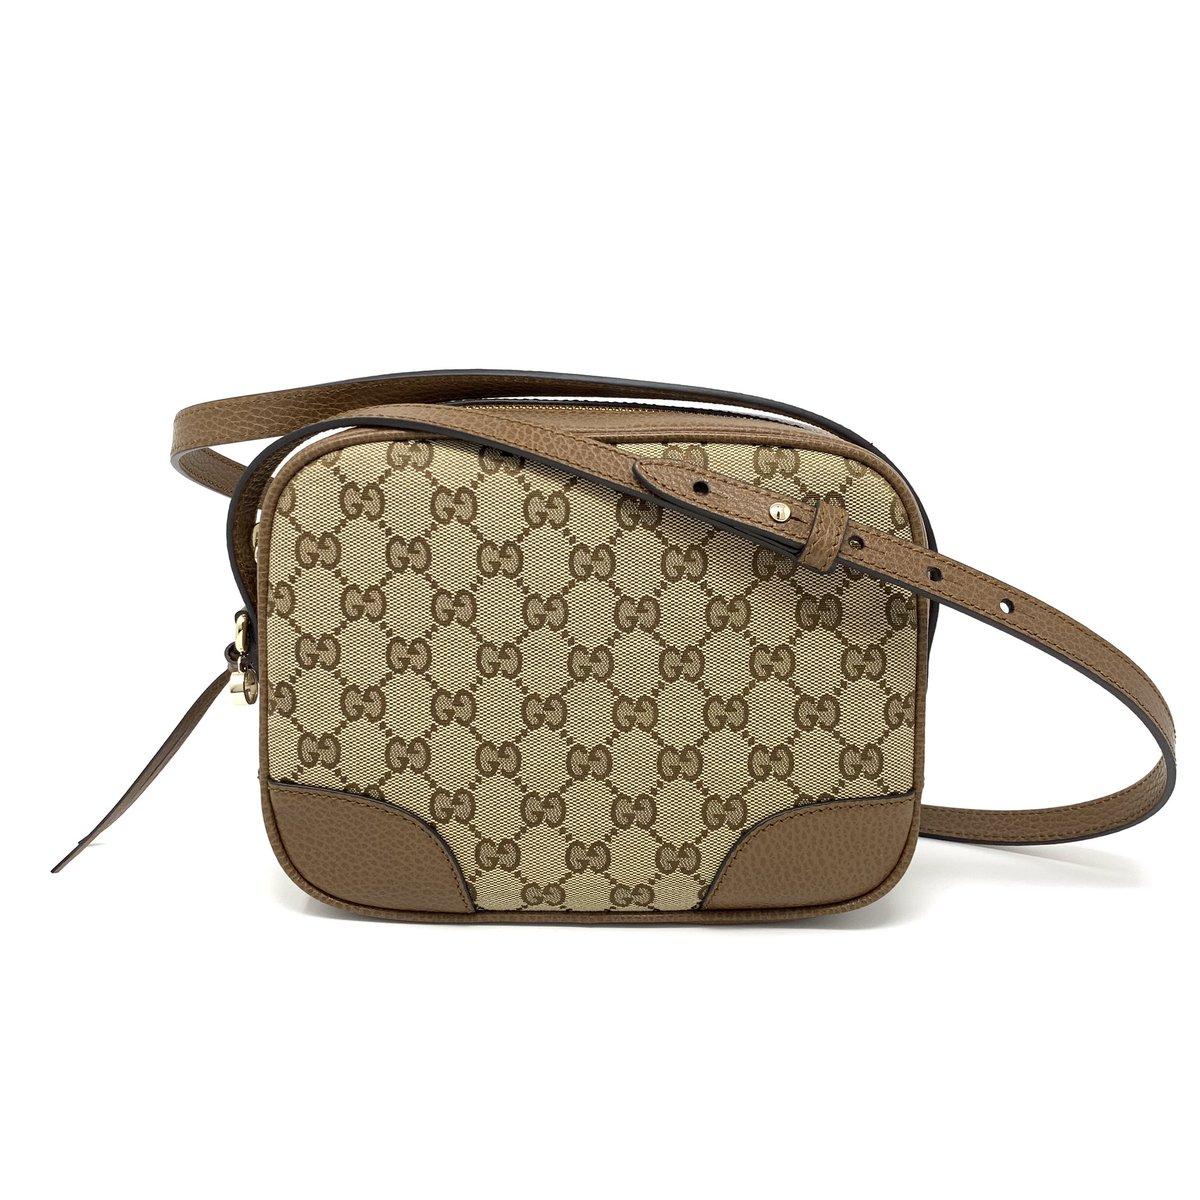 fdd9b702b Brand new Gucci Bree crossbody bag. #gucci #guccicanvas #guccimarmont  #guccibag #guccisneakerspic.twitter.com/ZhHXslnsXQ